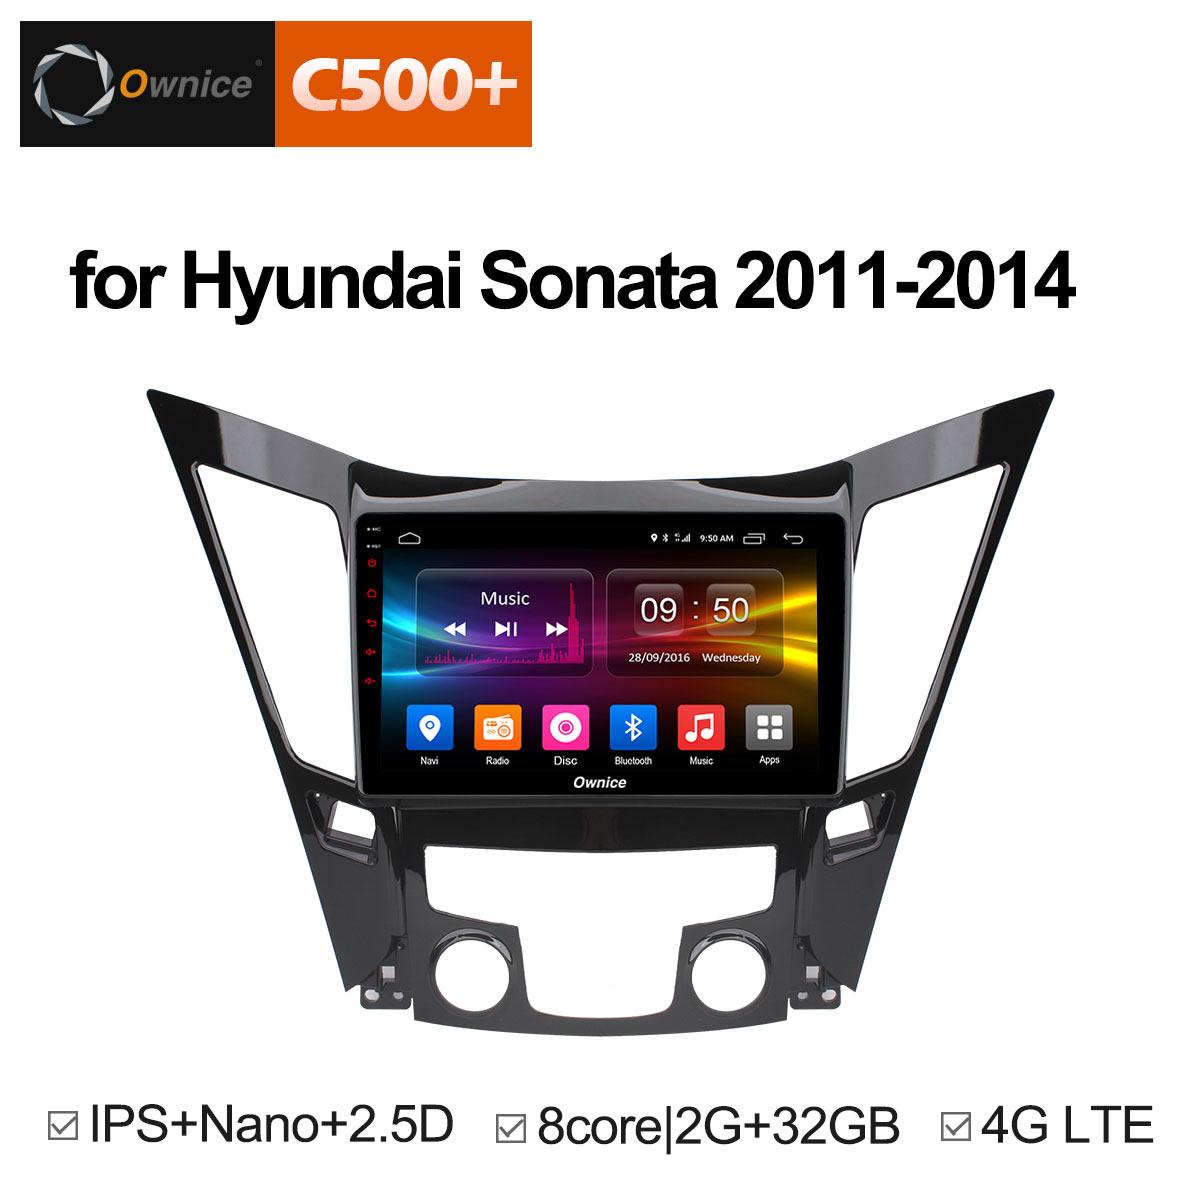 Штатная магнитола CARMEDIA OL-9716-8 (C500+) Hyundai SONATA YF 2010-2013 штатная магнитола daystar ds 7067hd hyundai elantra 2013 android 8 1 0 8 ядер 2gb озу 32gb памяти